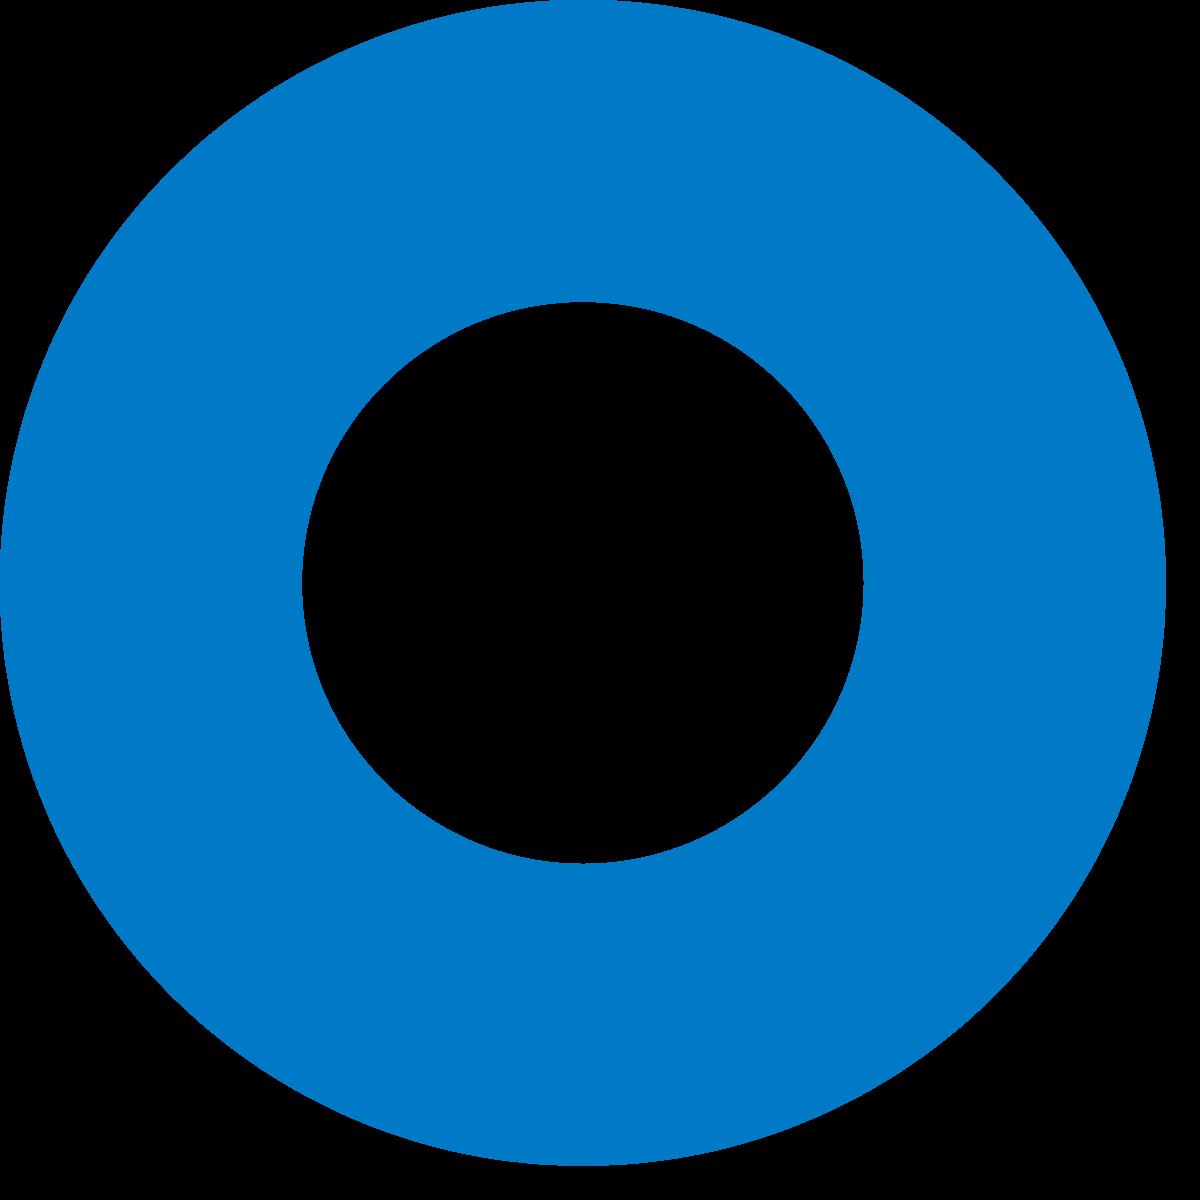 1200x1200 Blue Circle Industries